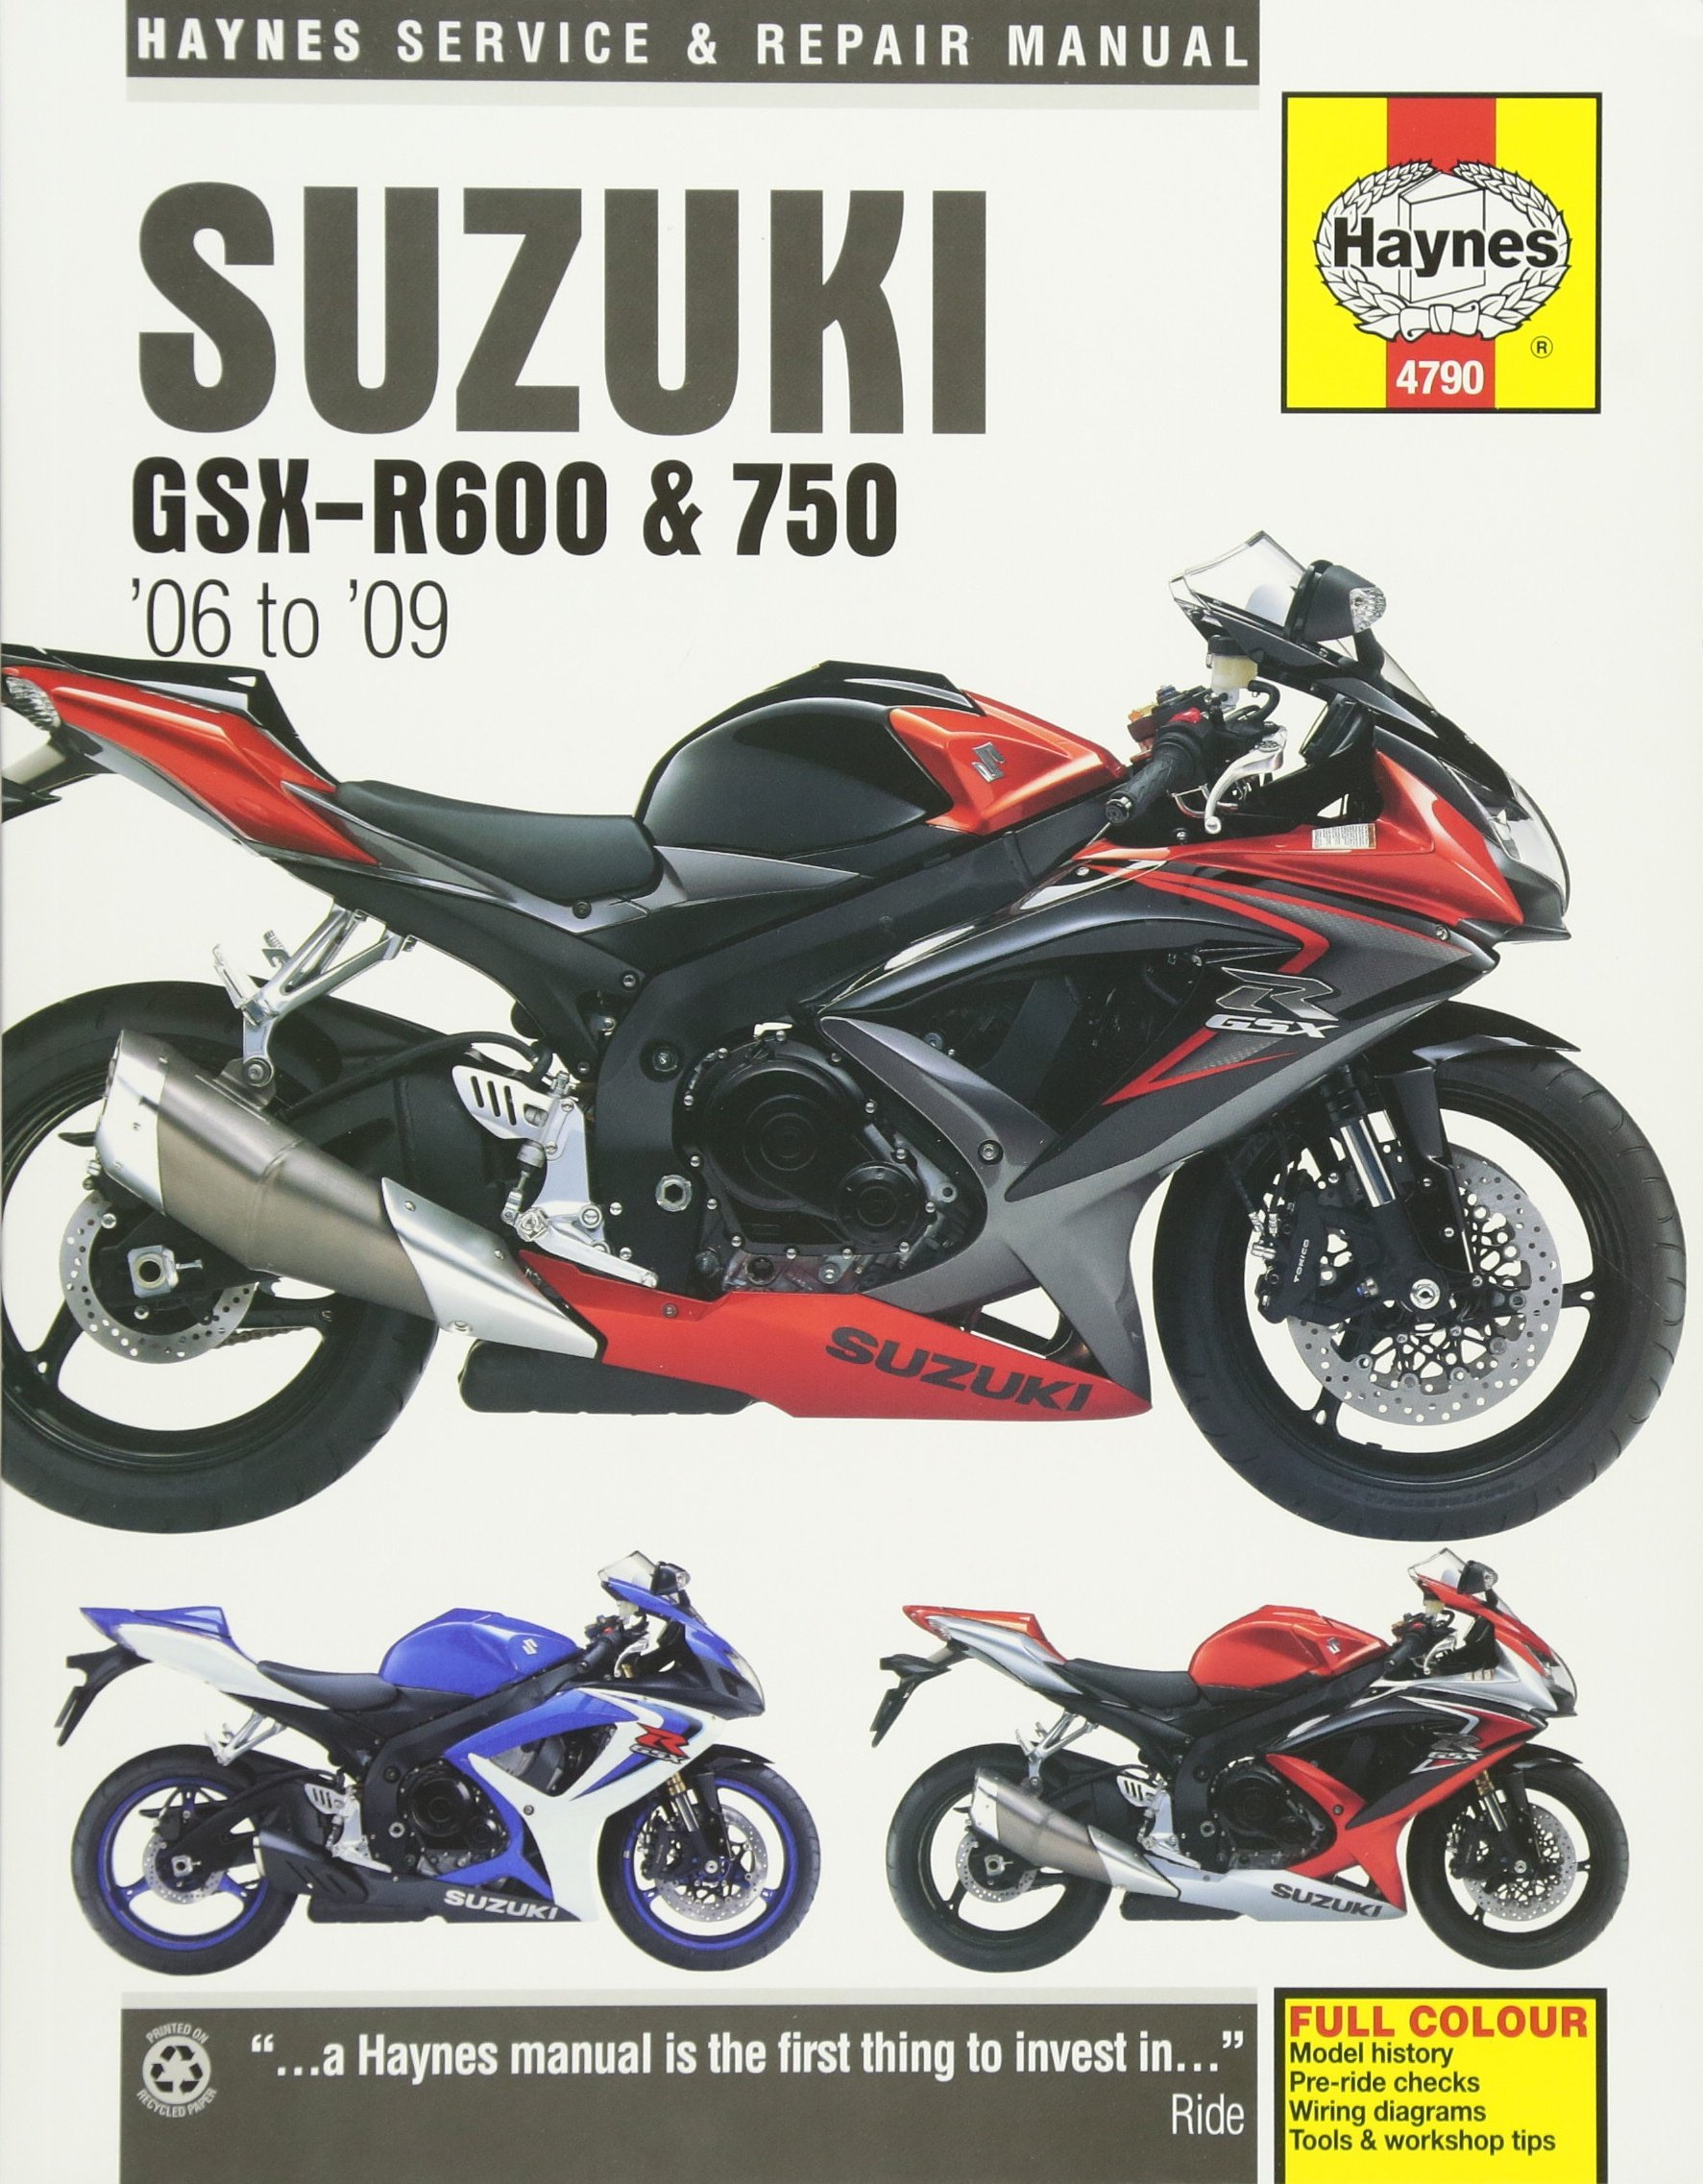 Suzuki GSX-R600 & 750 '06 to '09 (Haynes Service & Repair Manual): Editors  of Haynes Manuals: 9781785210433: Amazon.com: Books